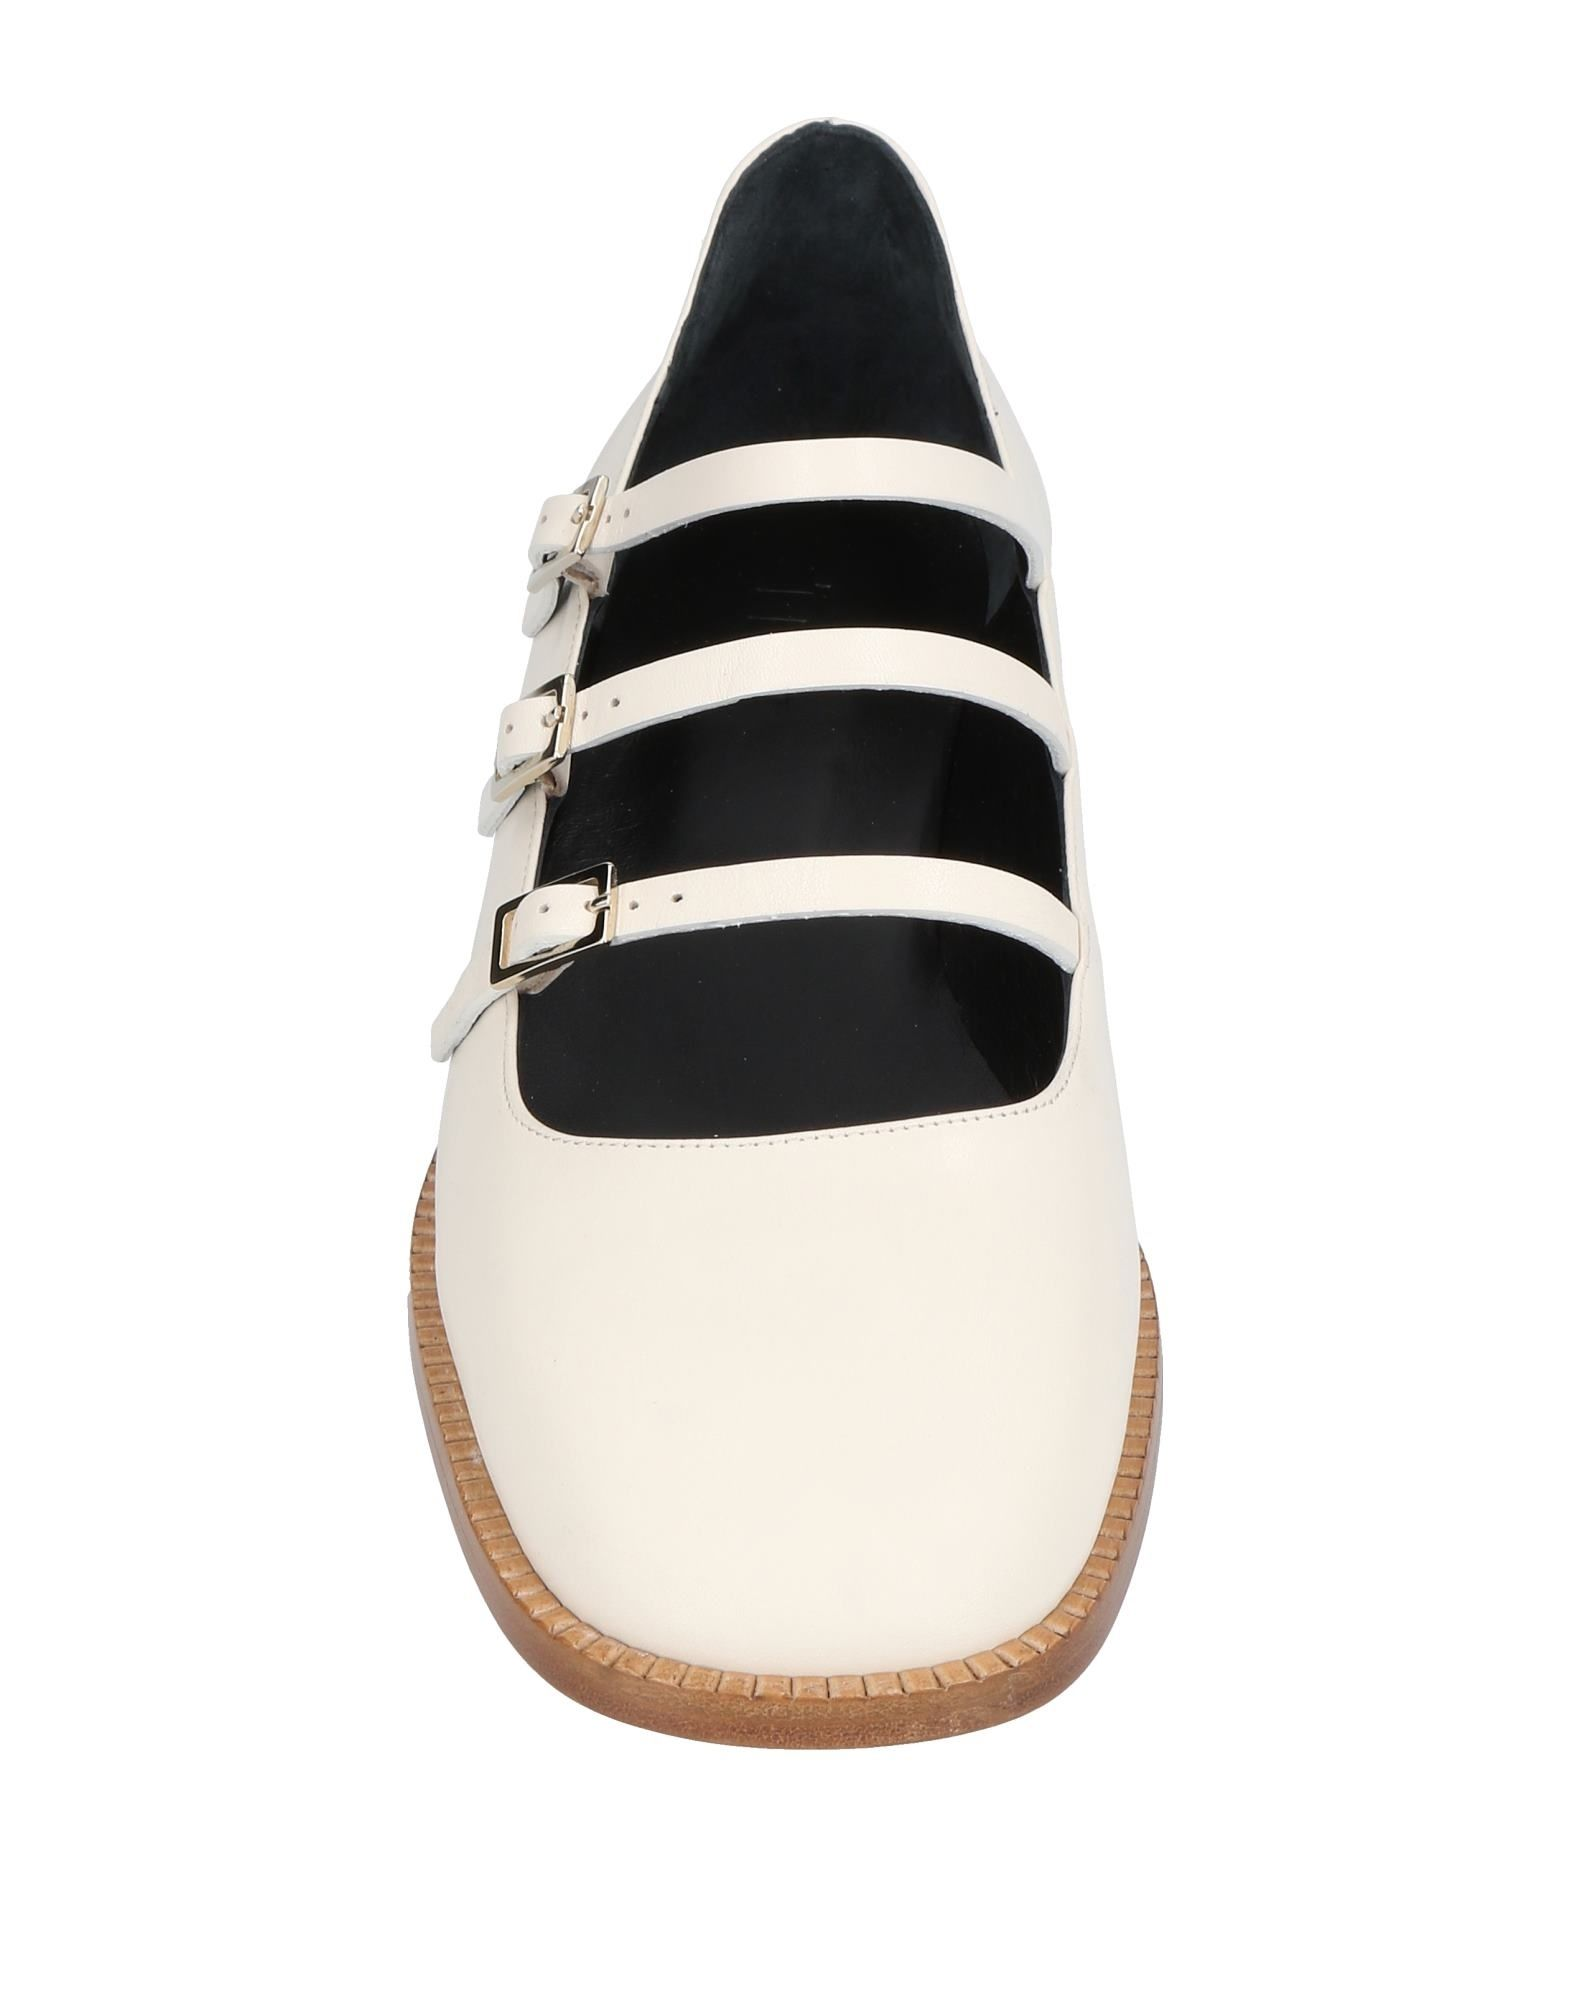 Stilvolle billige  Schuhe Tibi Ballerinas Damen  billige 11453260MC 5737e1